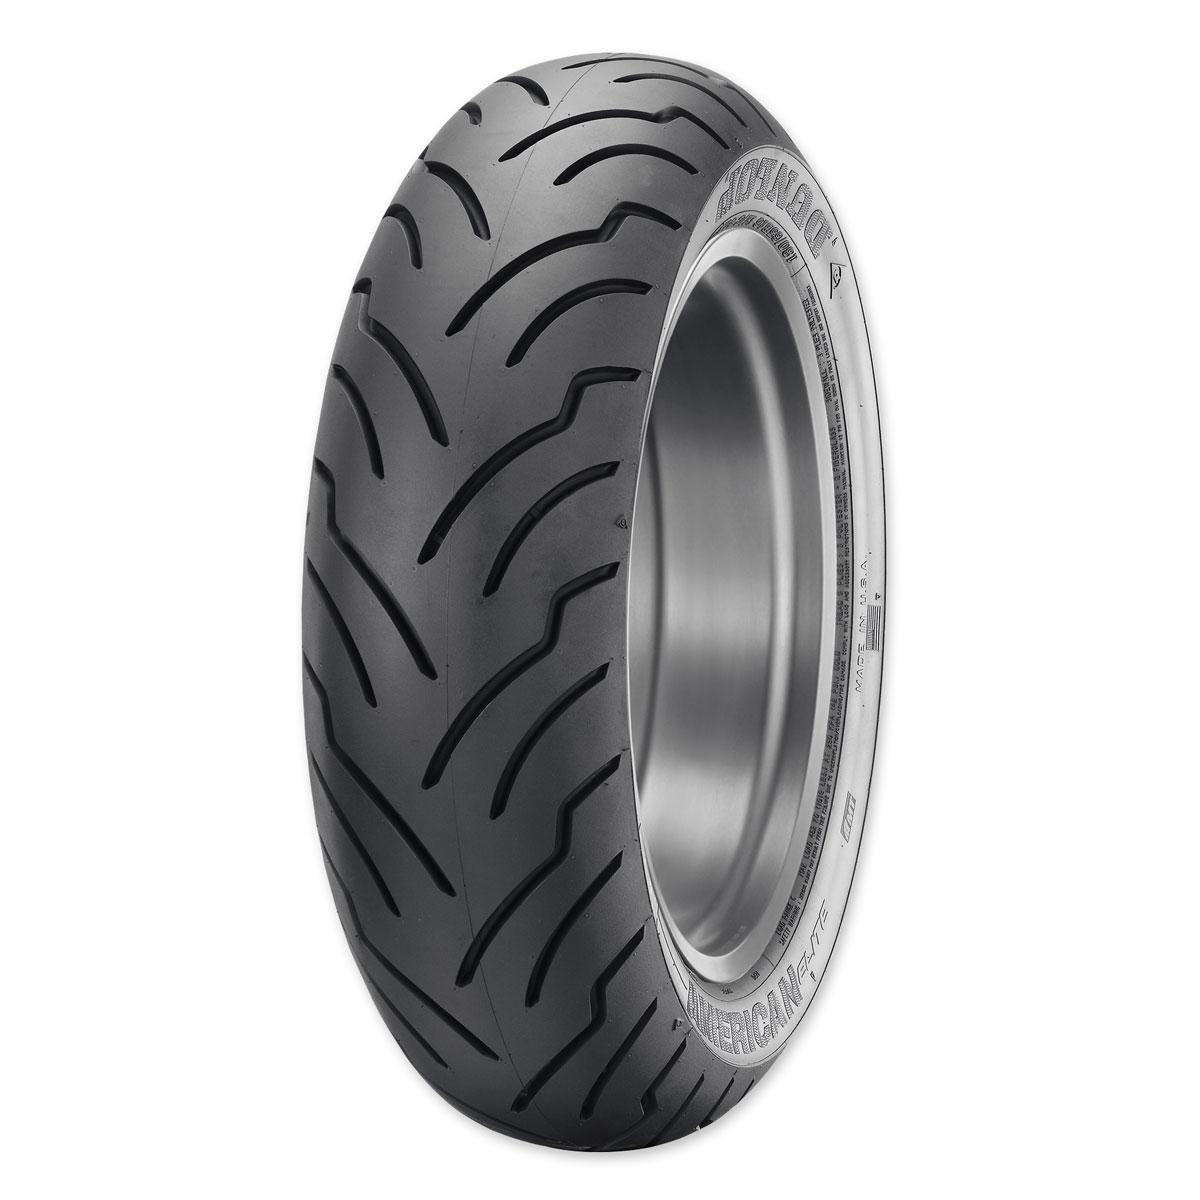 Dunlop American Elite MU85B16 77H Rear Tire